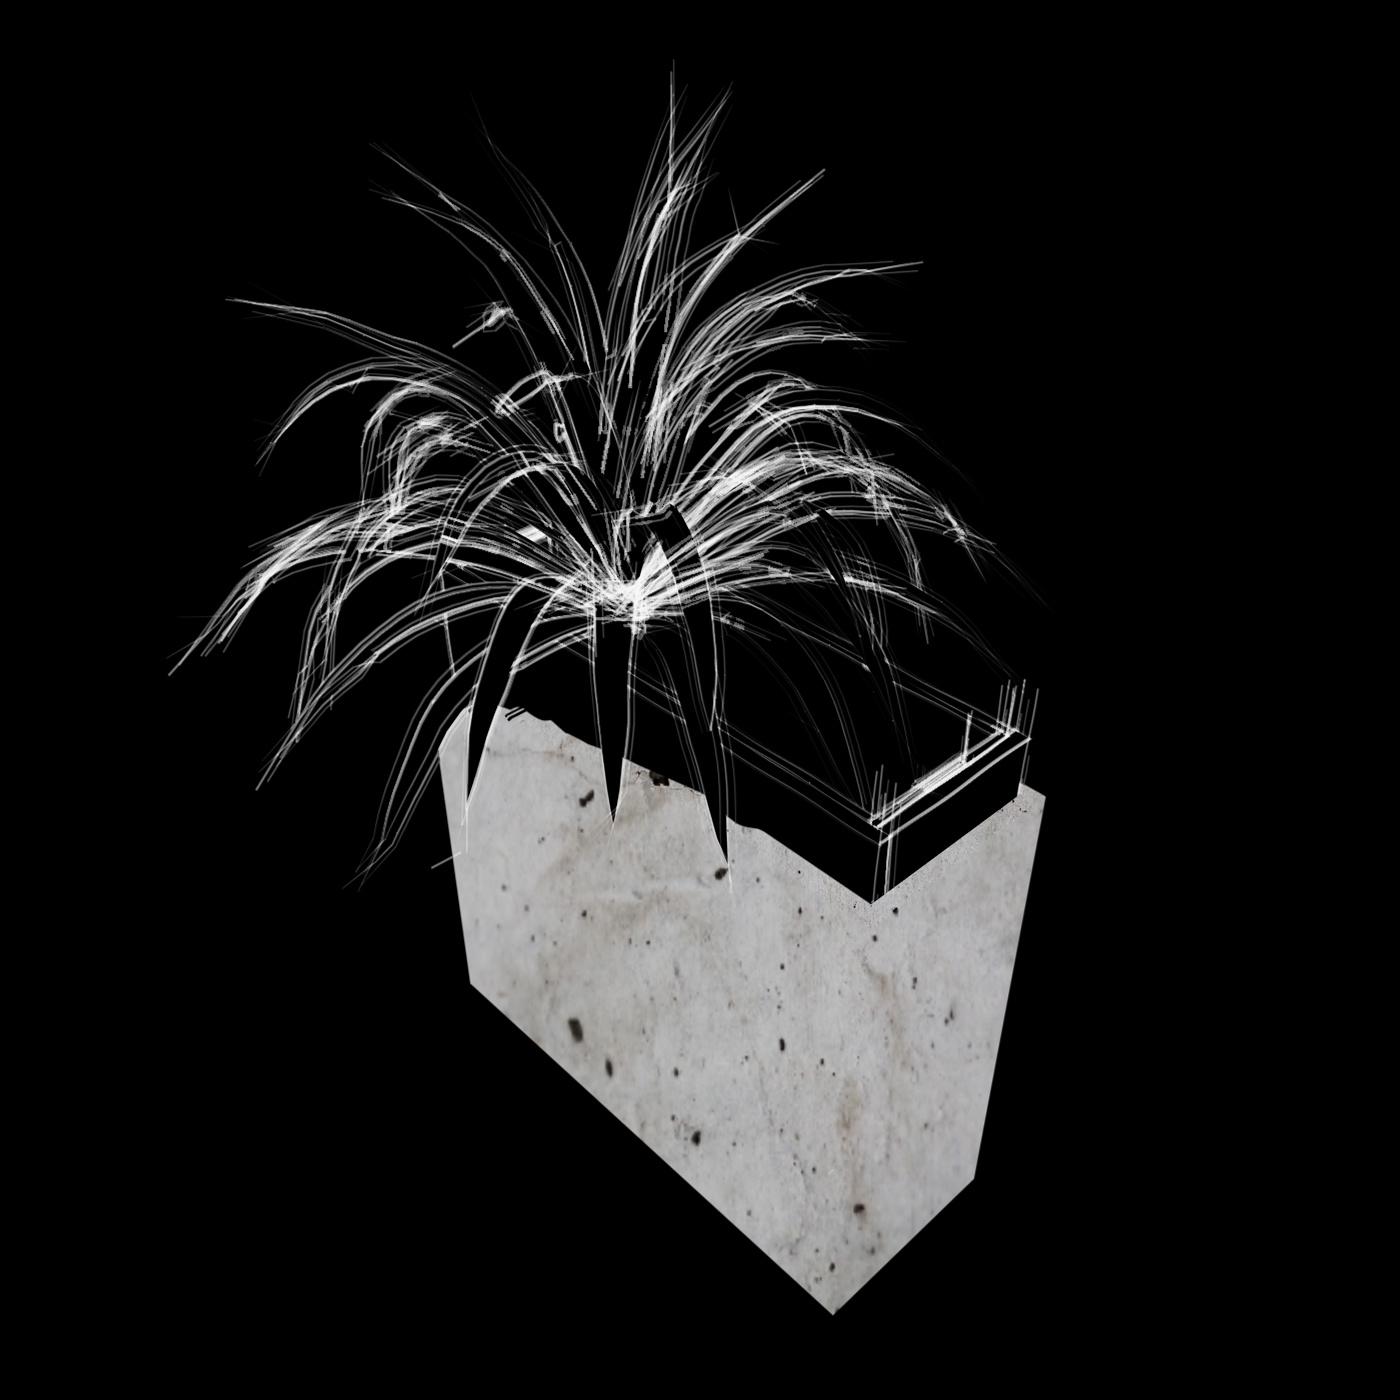 fioriera_sketch-02